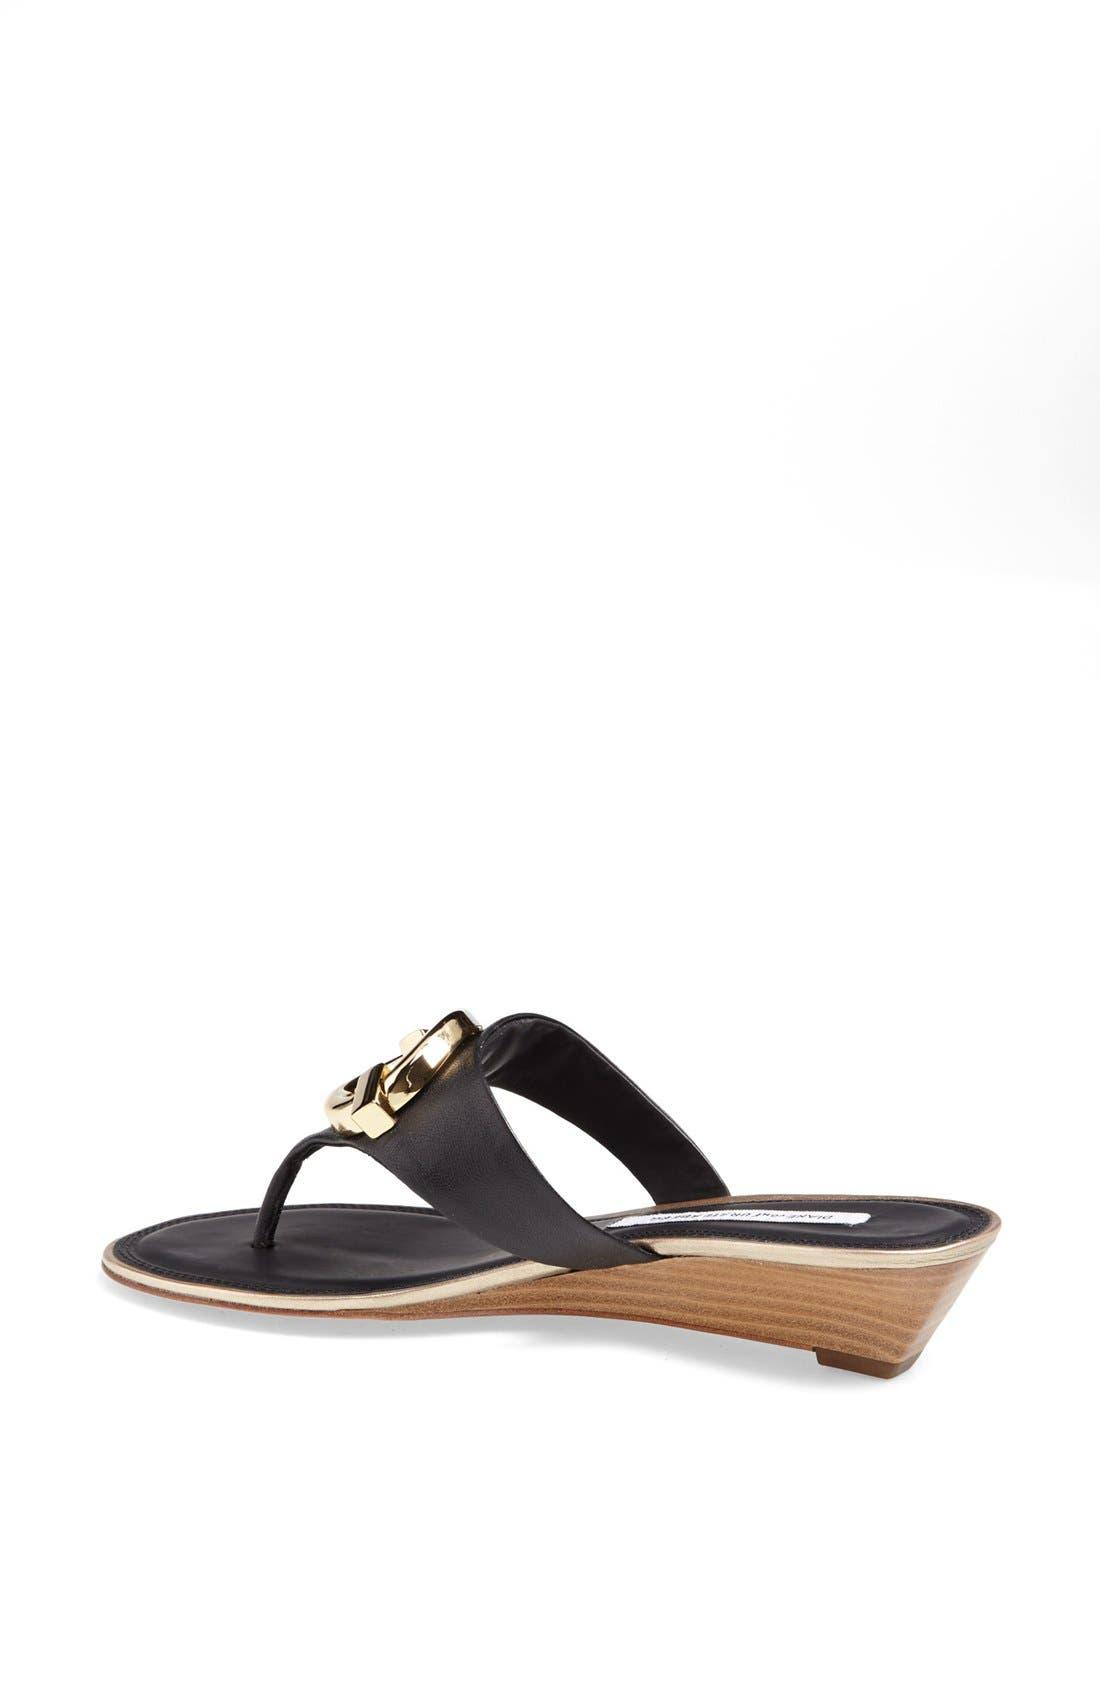 Alternate Image 2  - Diane von Furstenberg 'Tiles' Leather Sandal